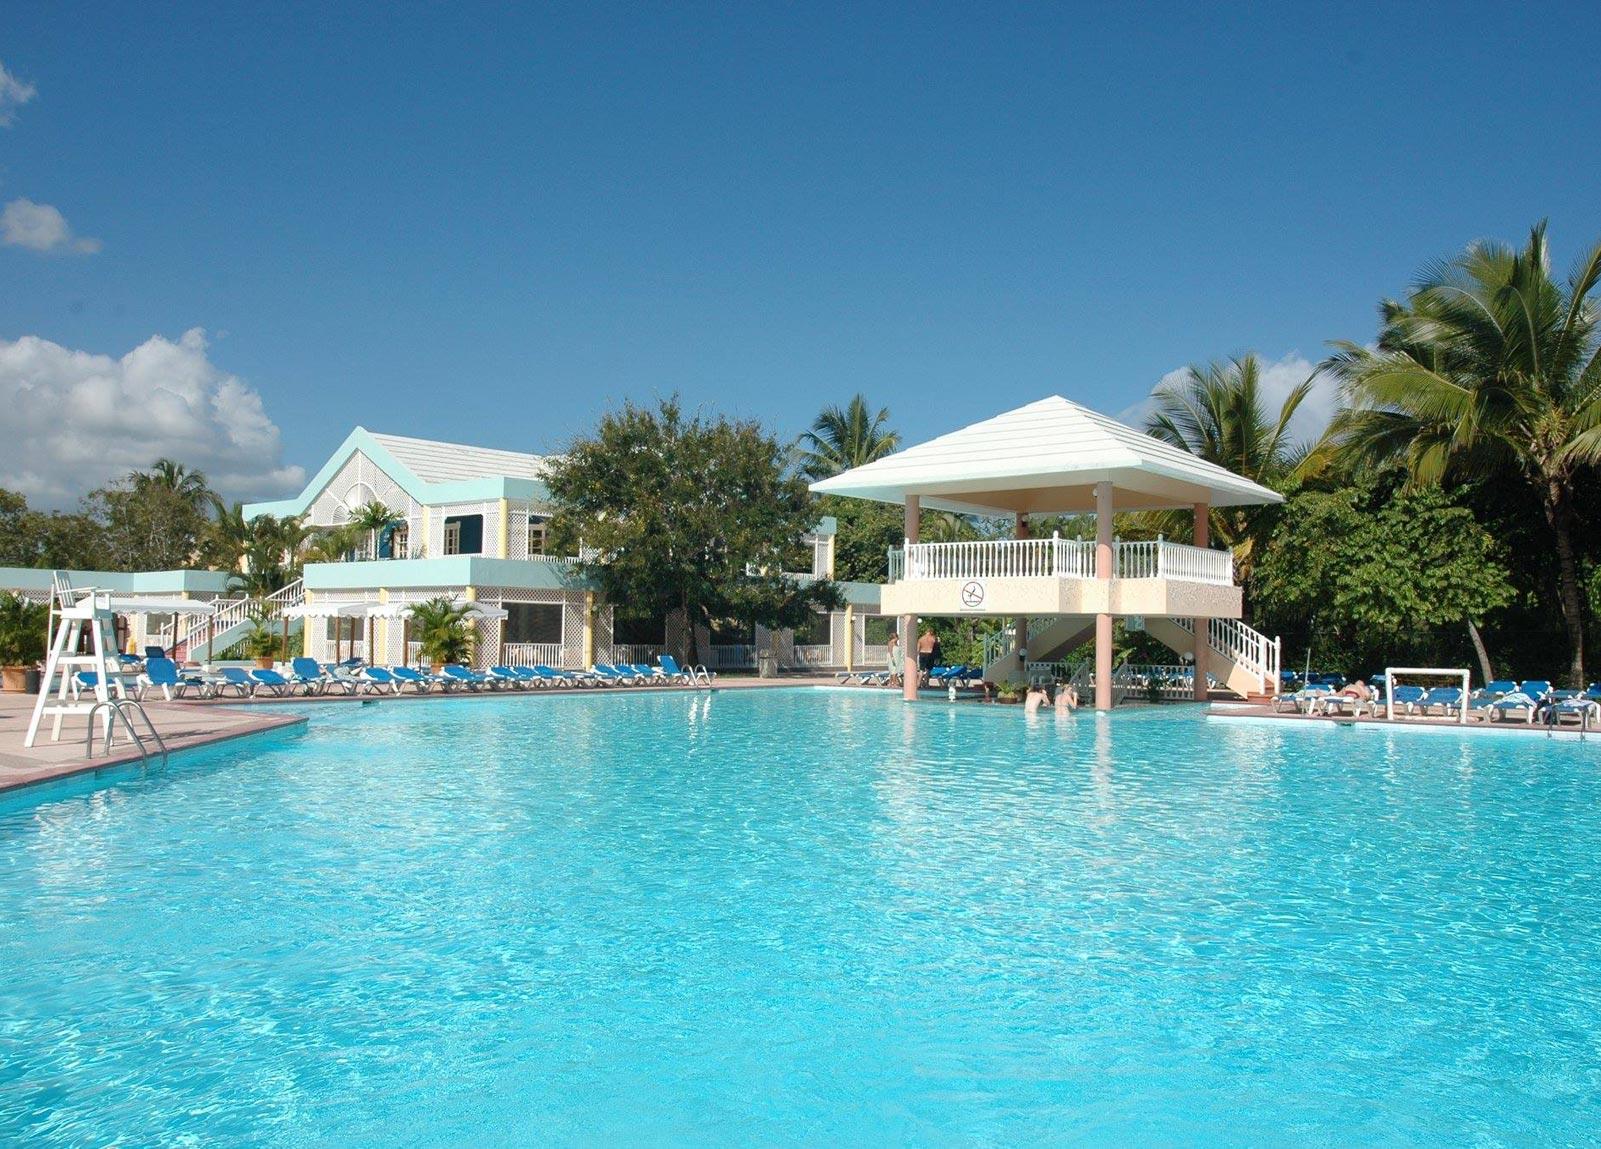 Puerto plata hotels puerto plata beach hotels for Poto planta